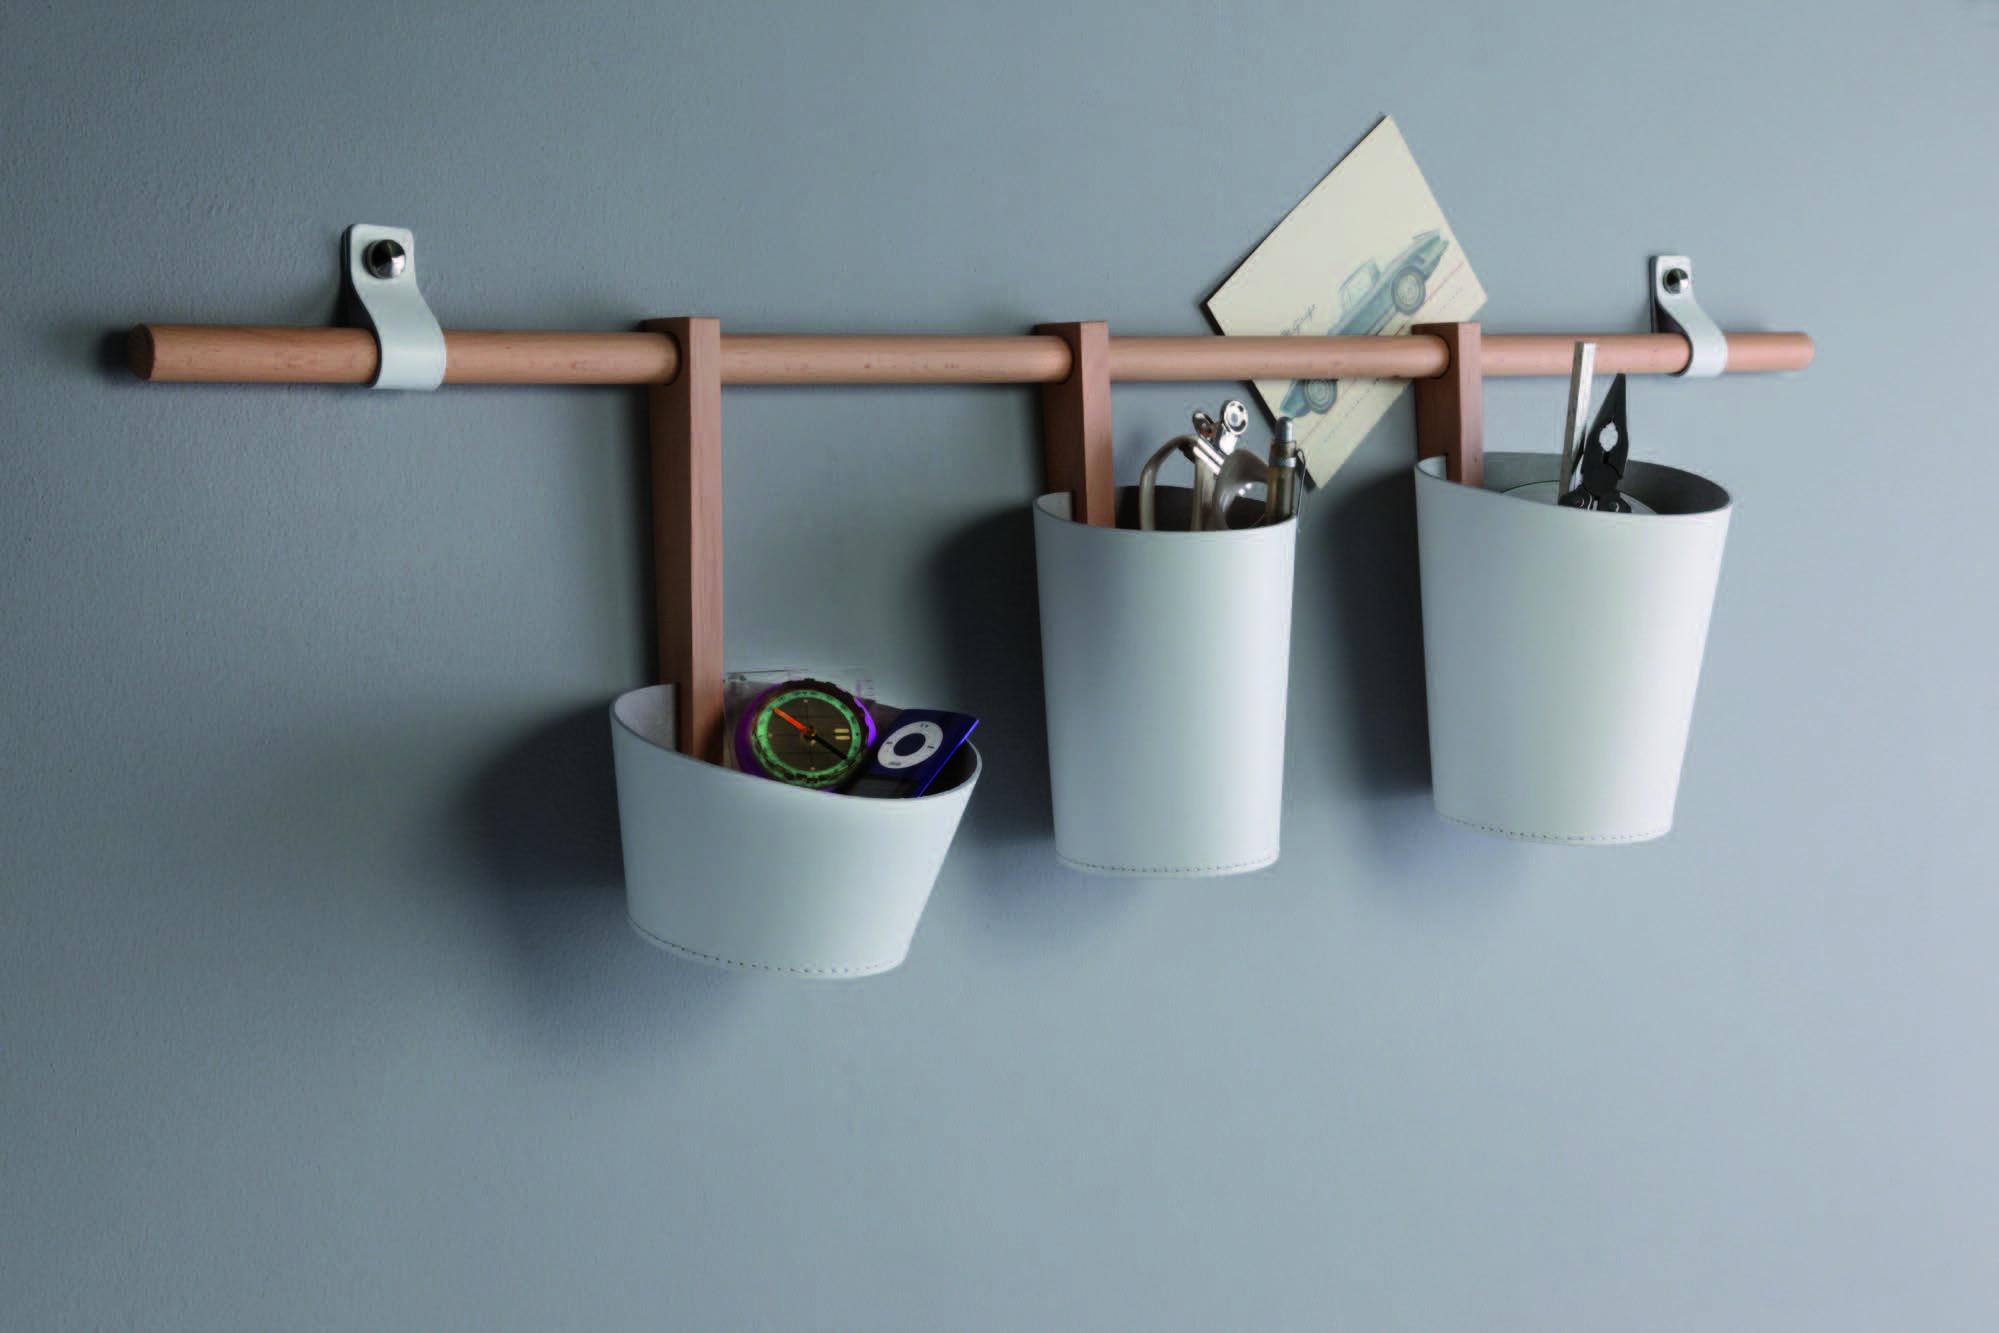 Catu negozio online officina del design for Negozi online design